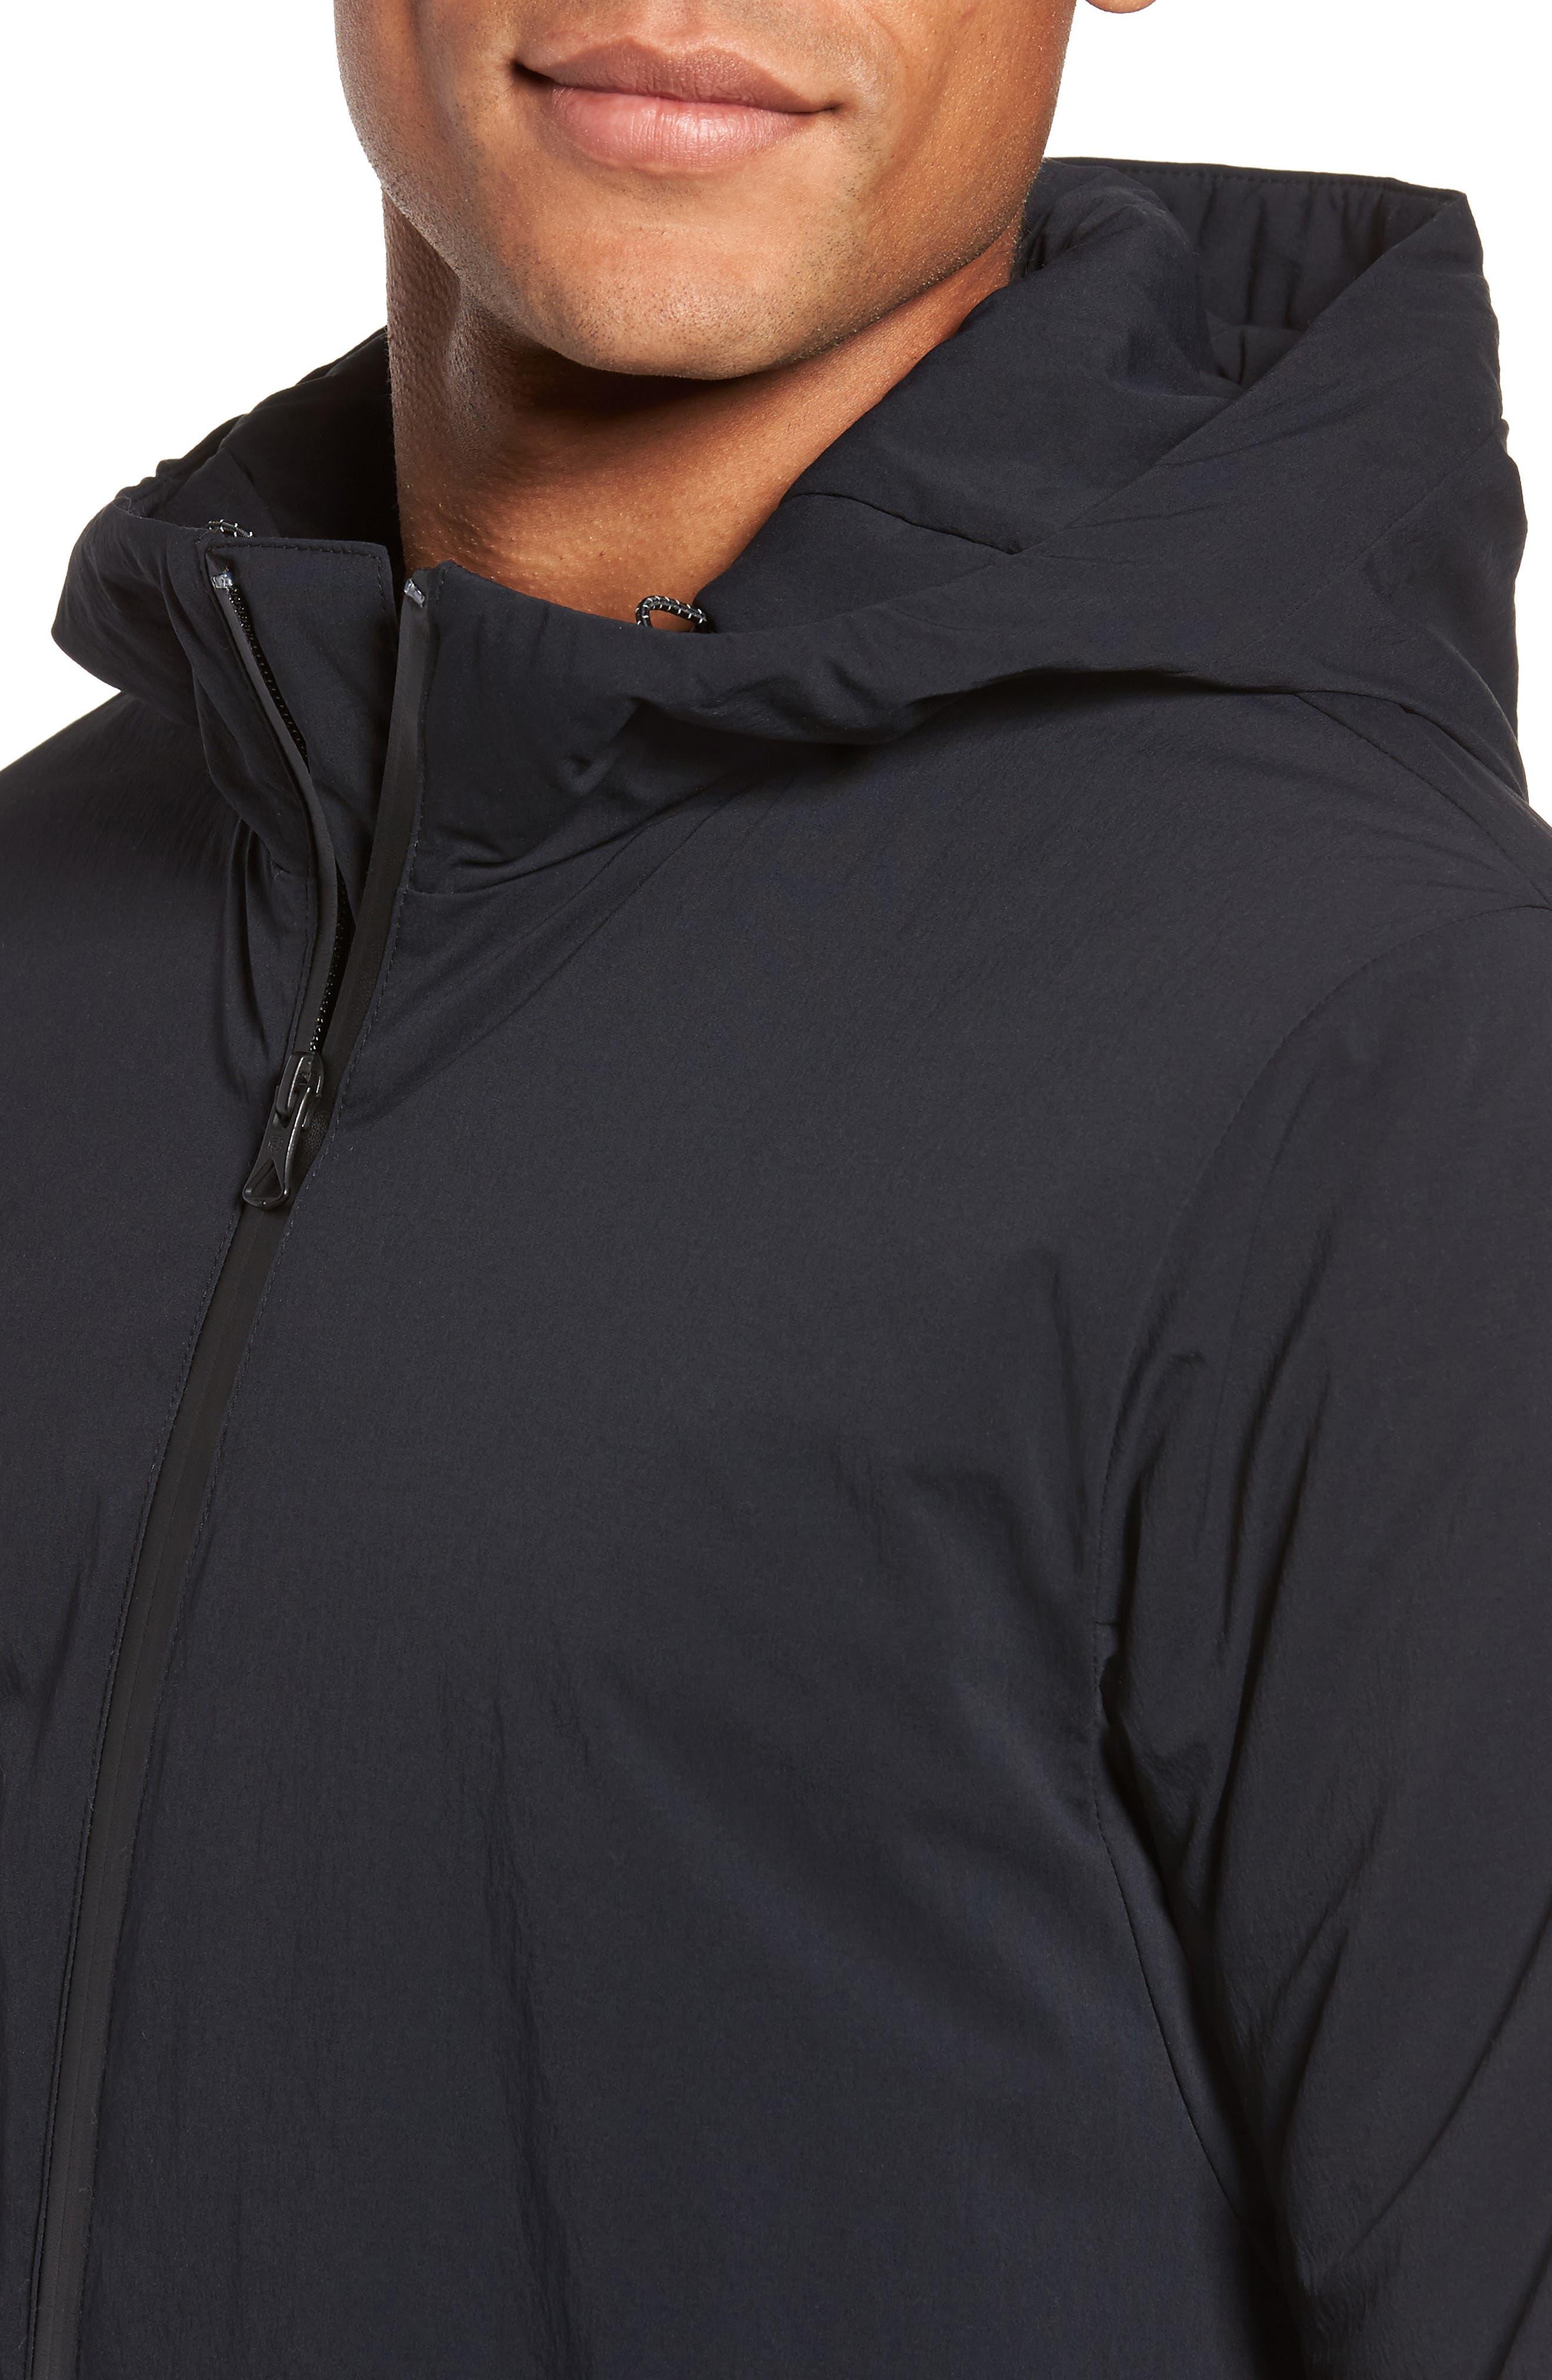 Insulated Trim Sideline Jacket,                             Alternate thumbnail 4, color,                             Black